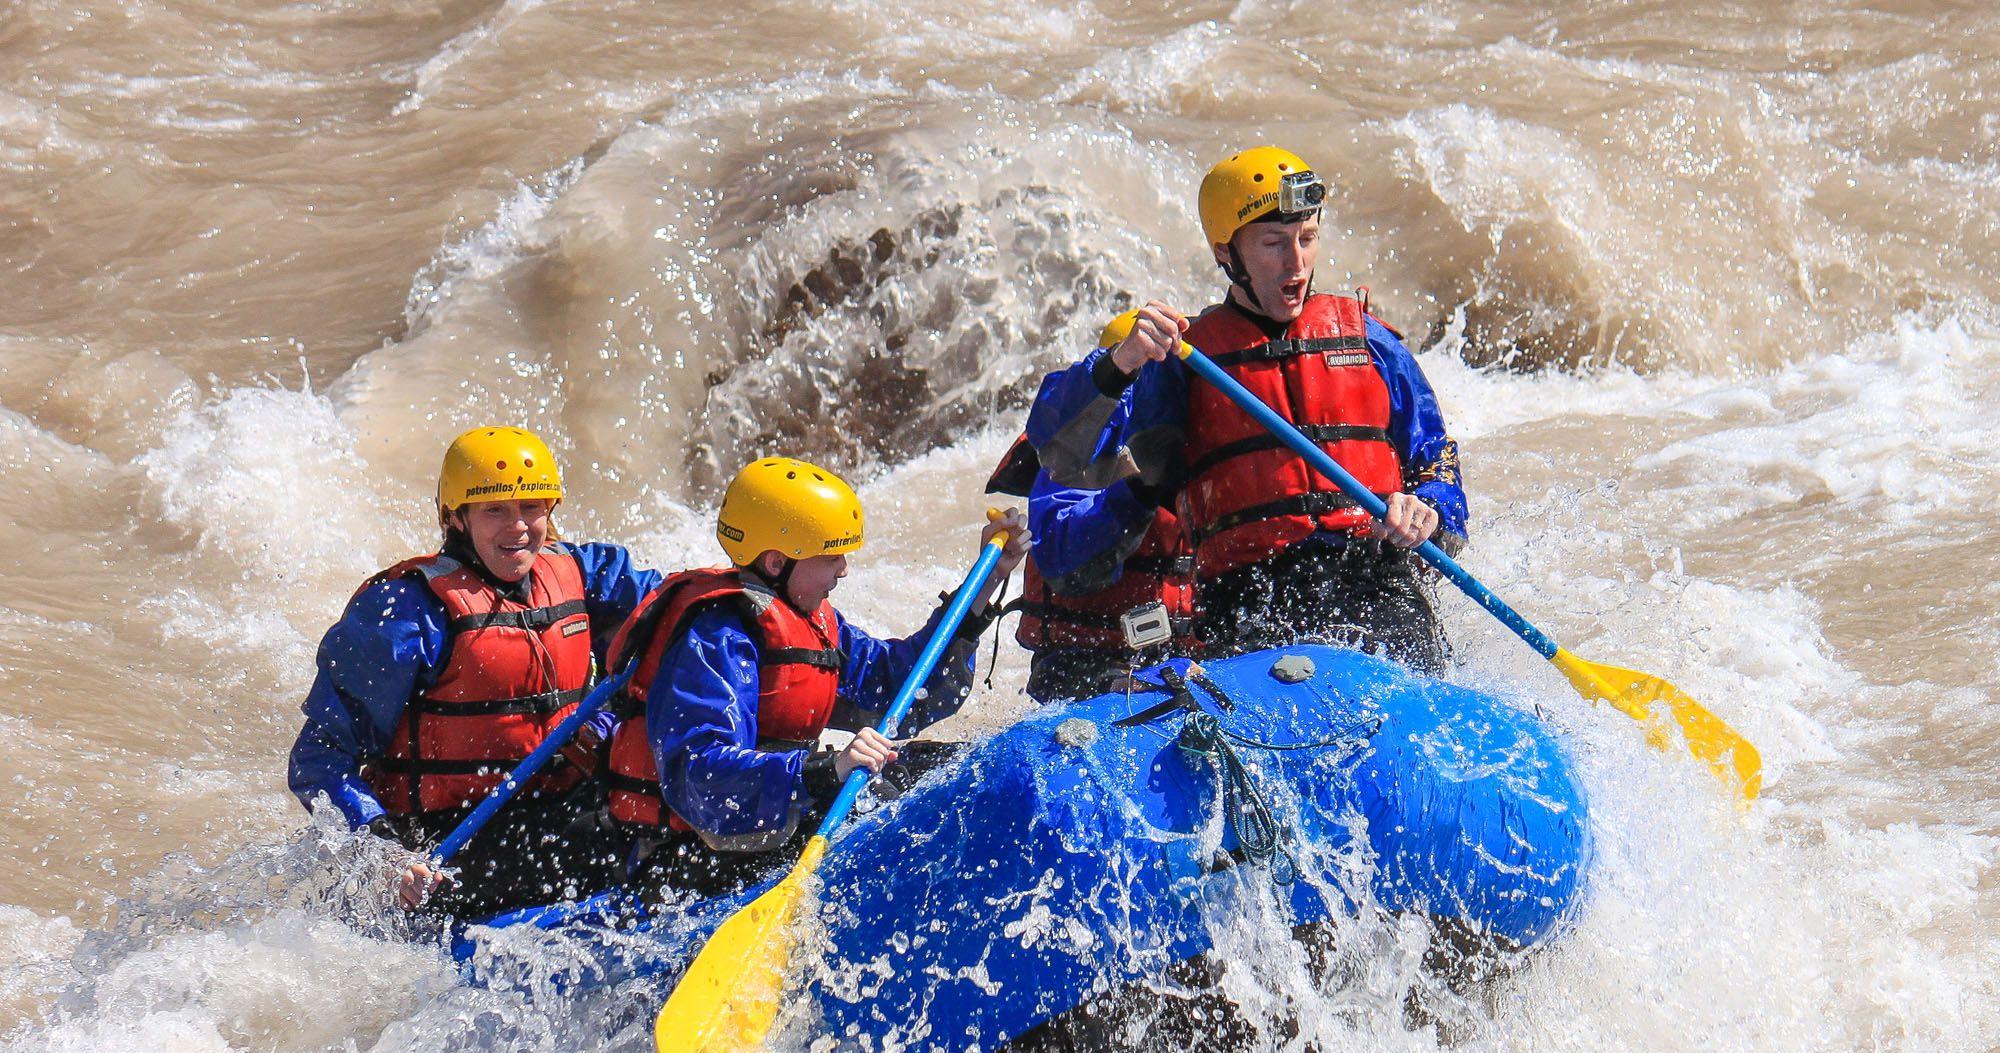 White Water Rafting Argentina